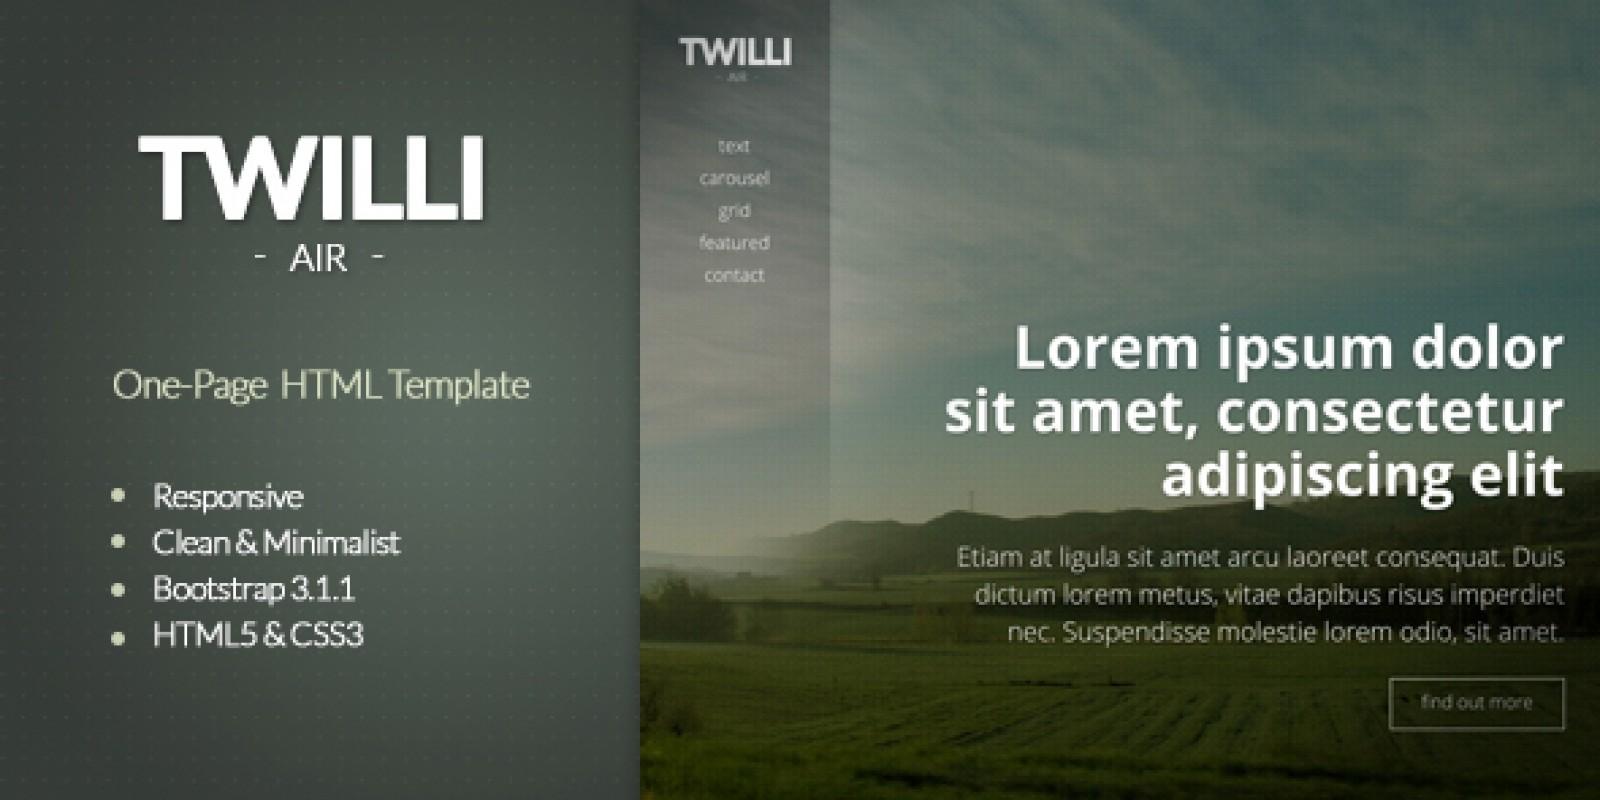 TWILLI Air - Minimalist OnePage HTML Template